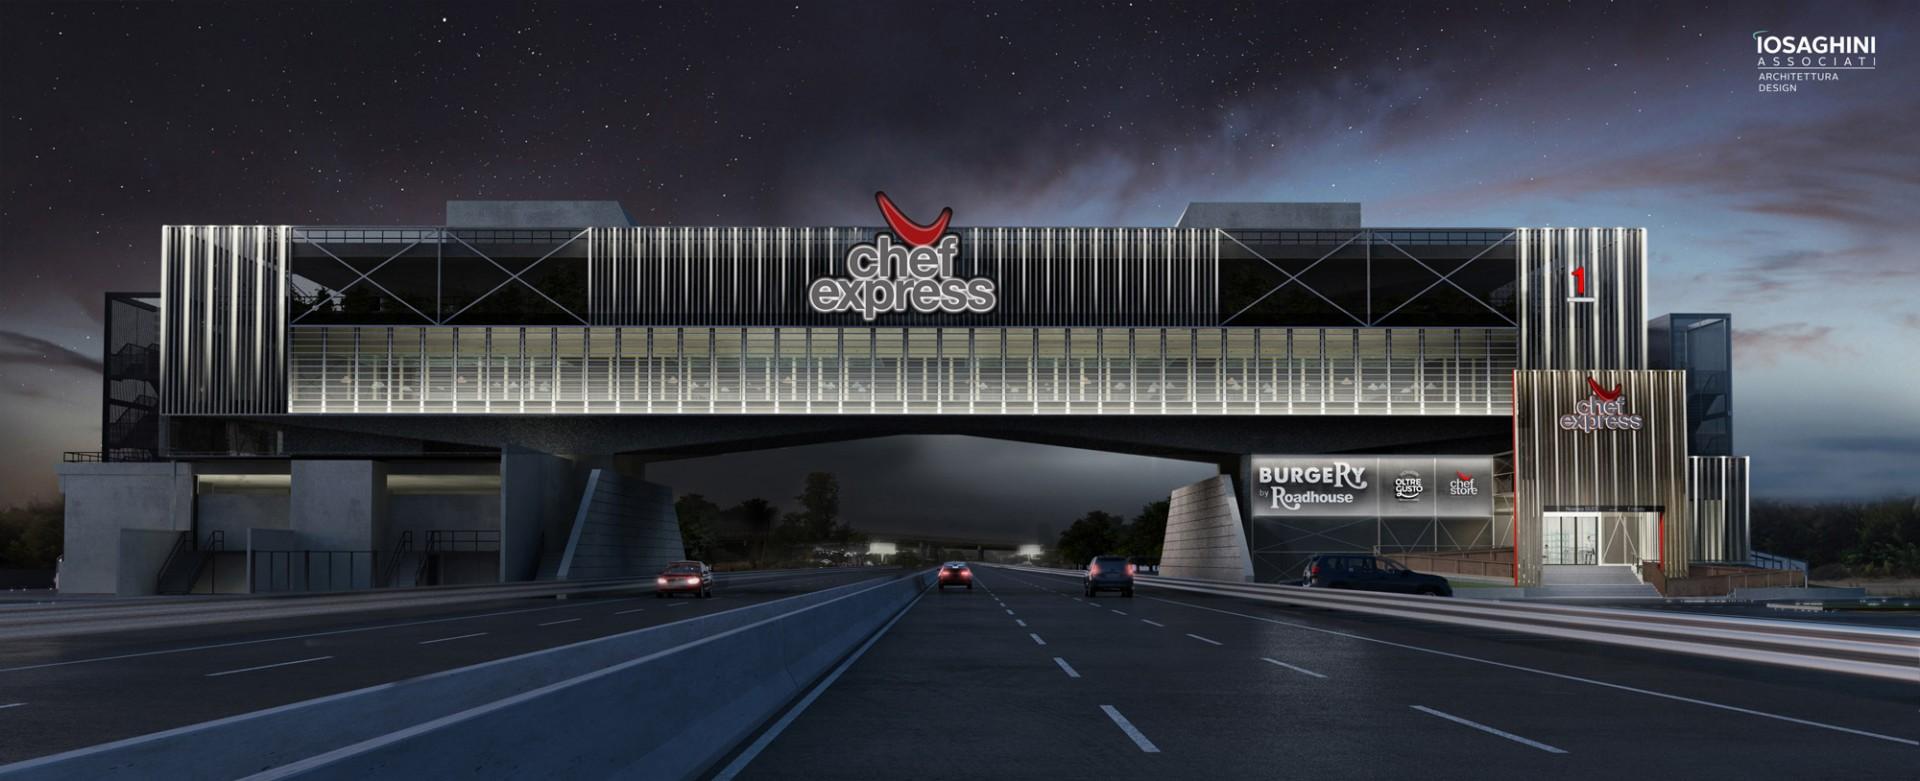 Iosa Ghini Associati neue Autobahnraststätte in Brückenbauweise in Novara